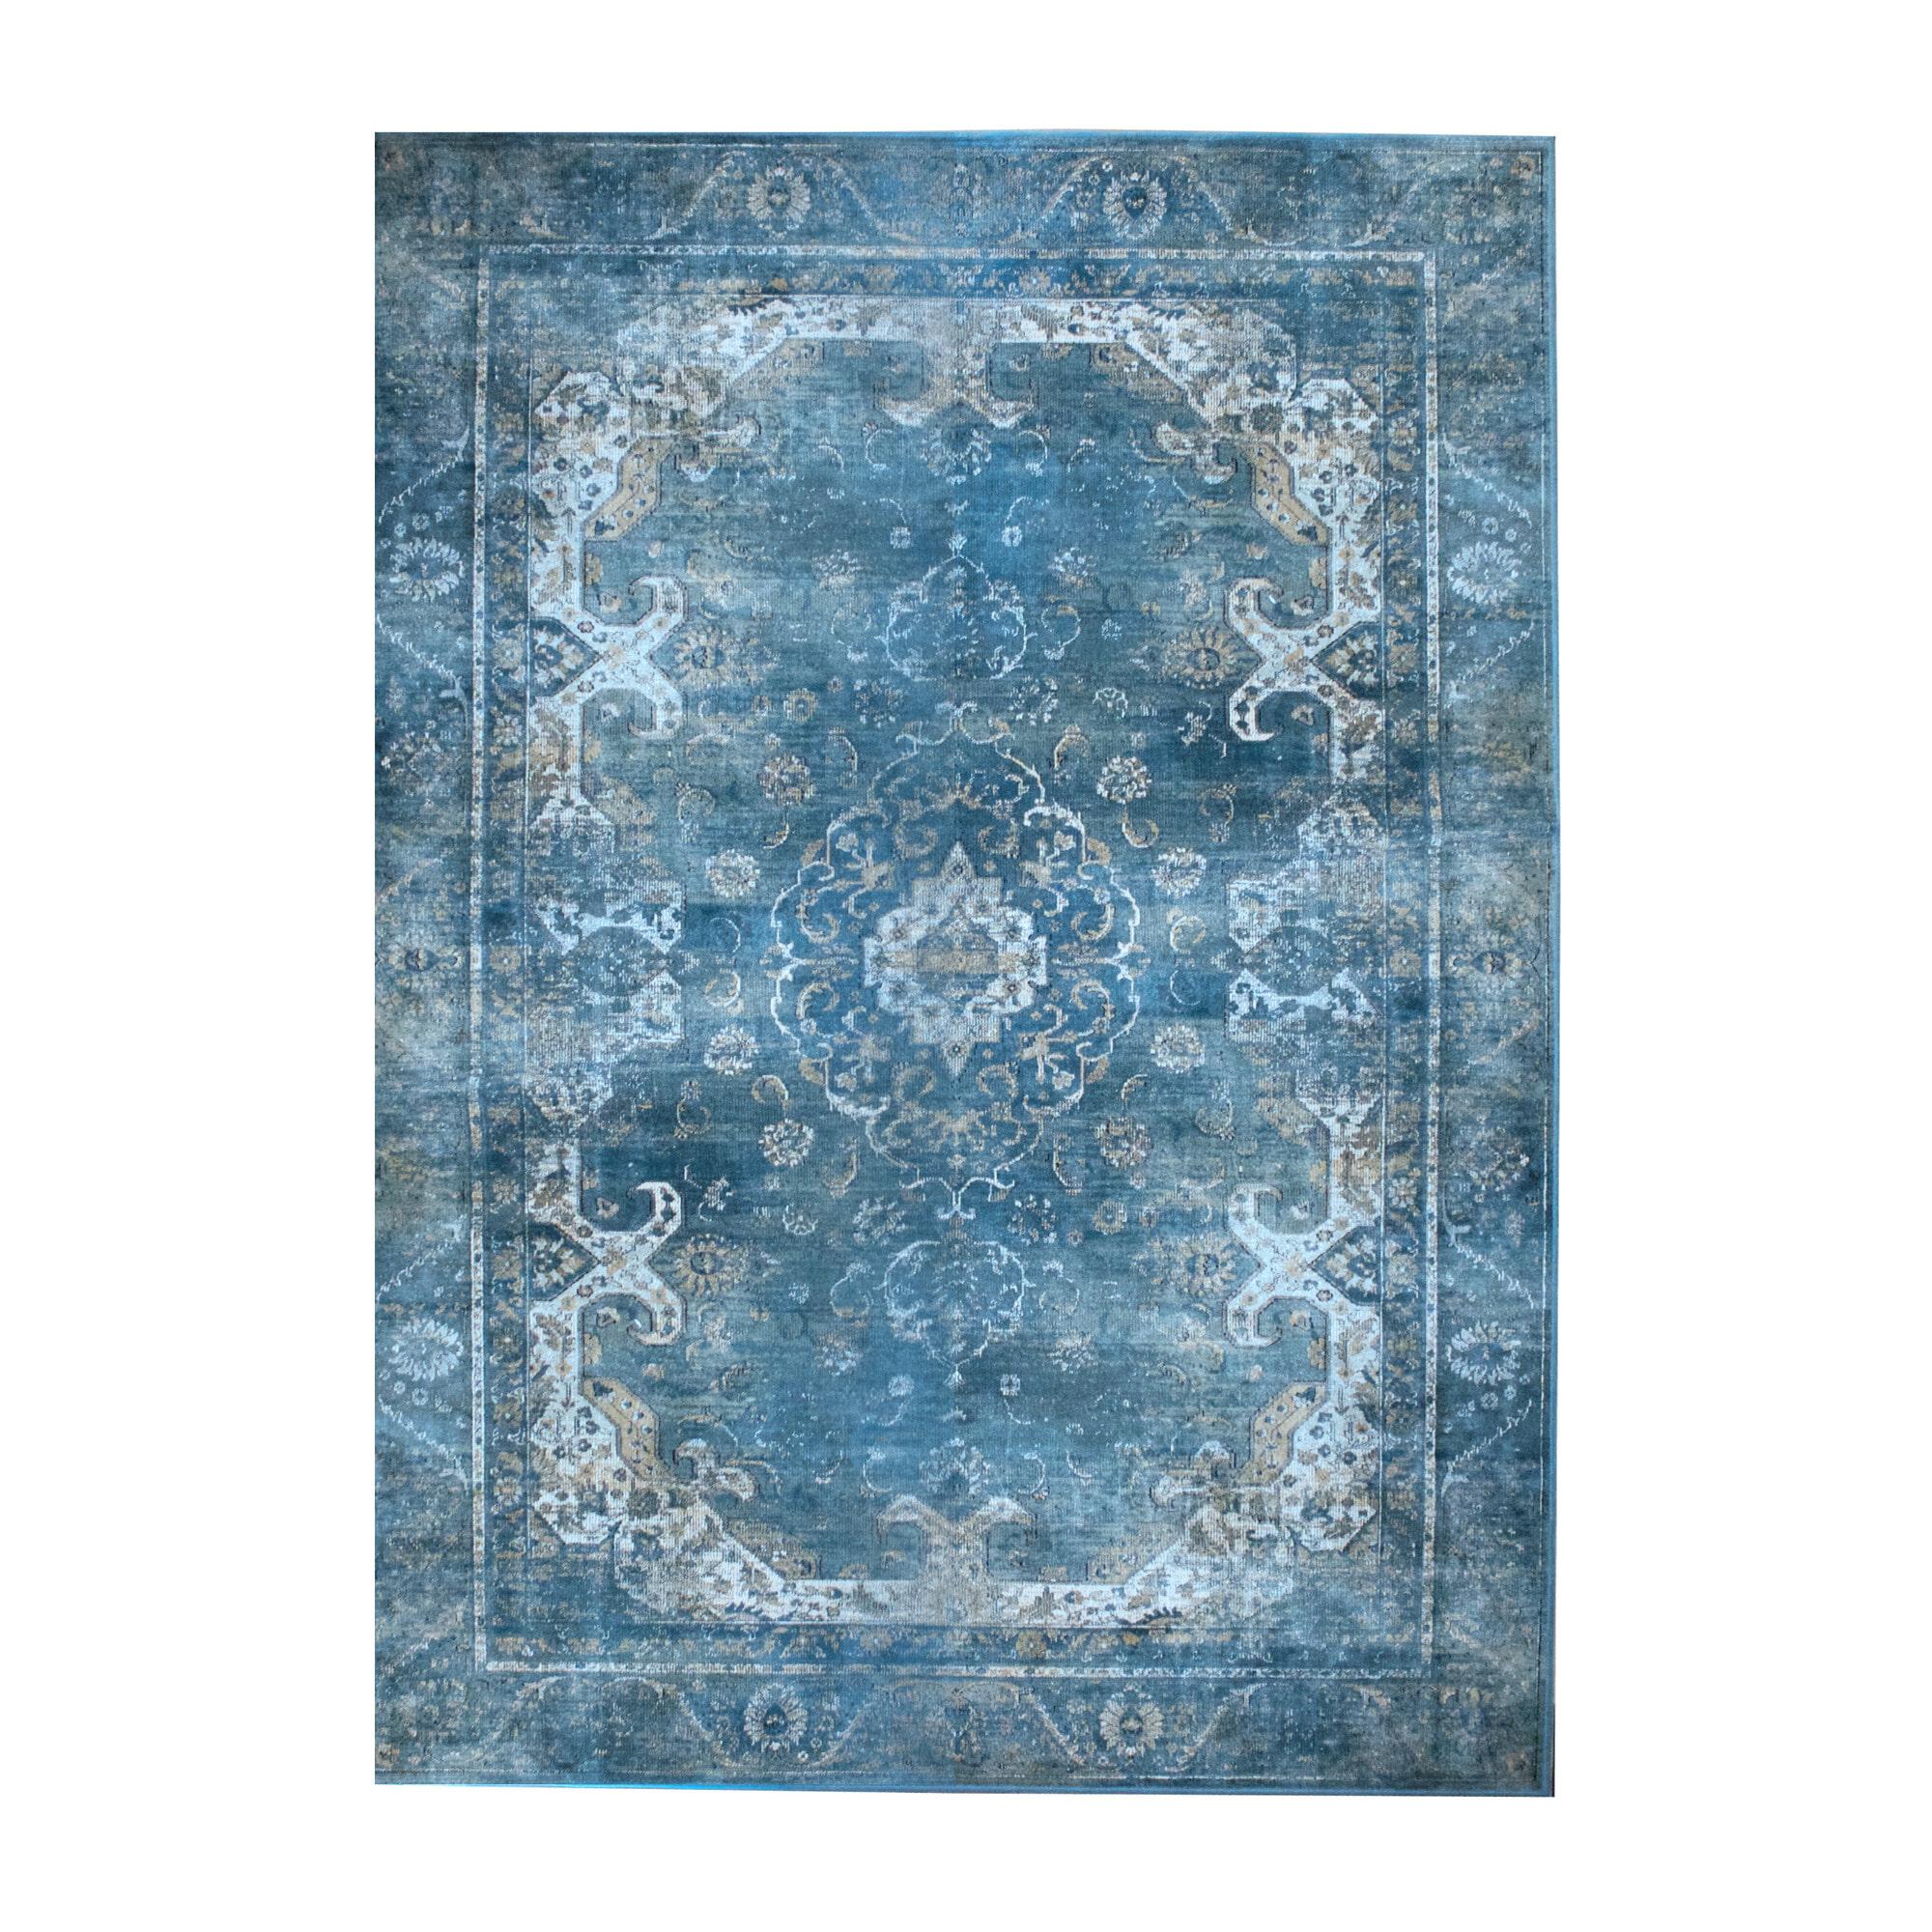 By-Boo Vloerkleed 'Liv' 160 x 230cm, kleur turquoise